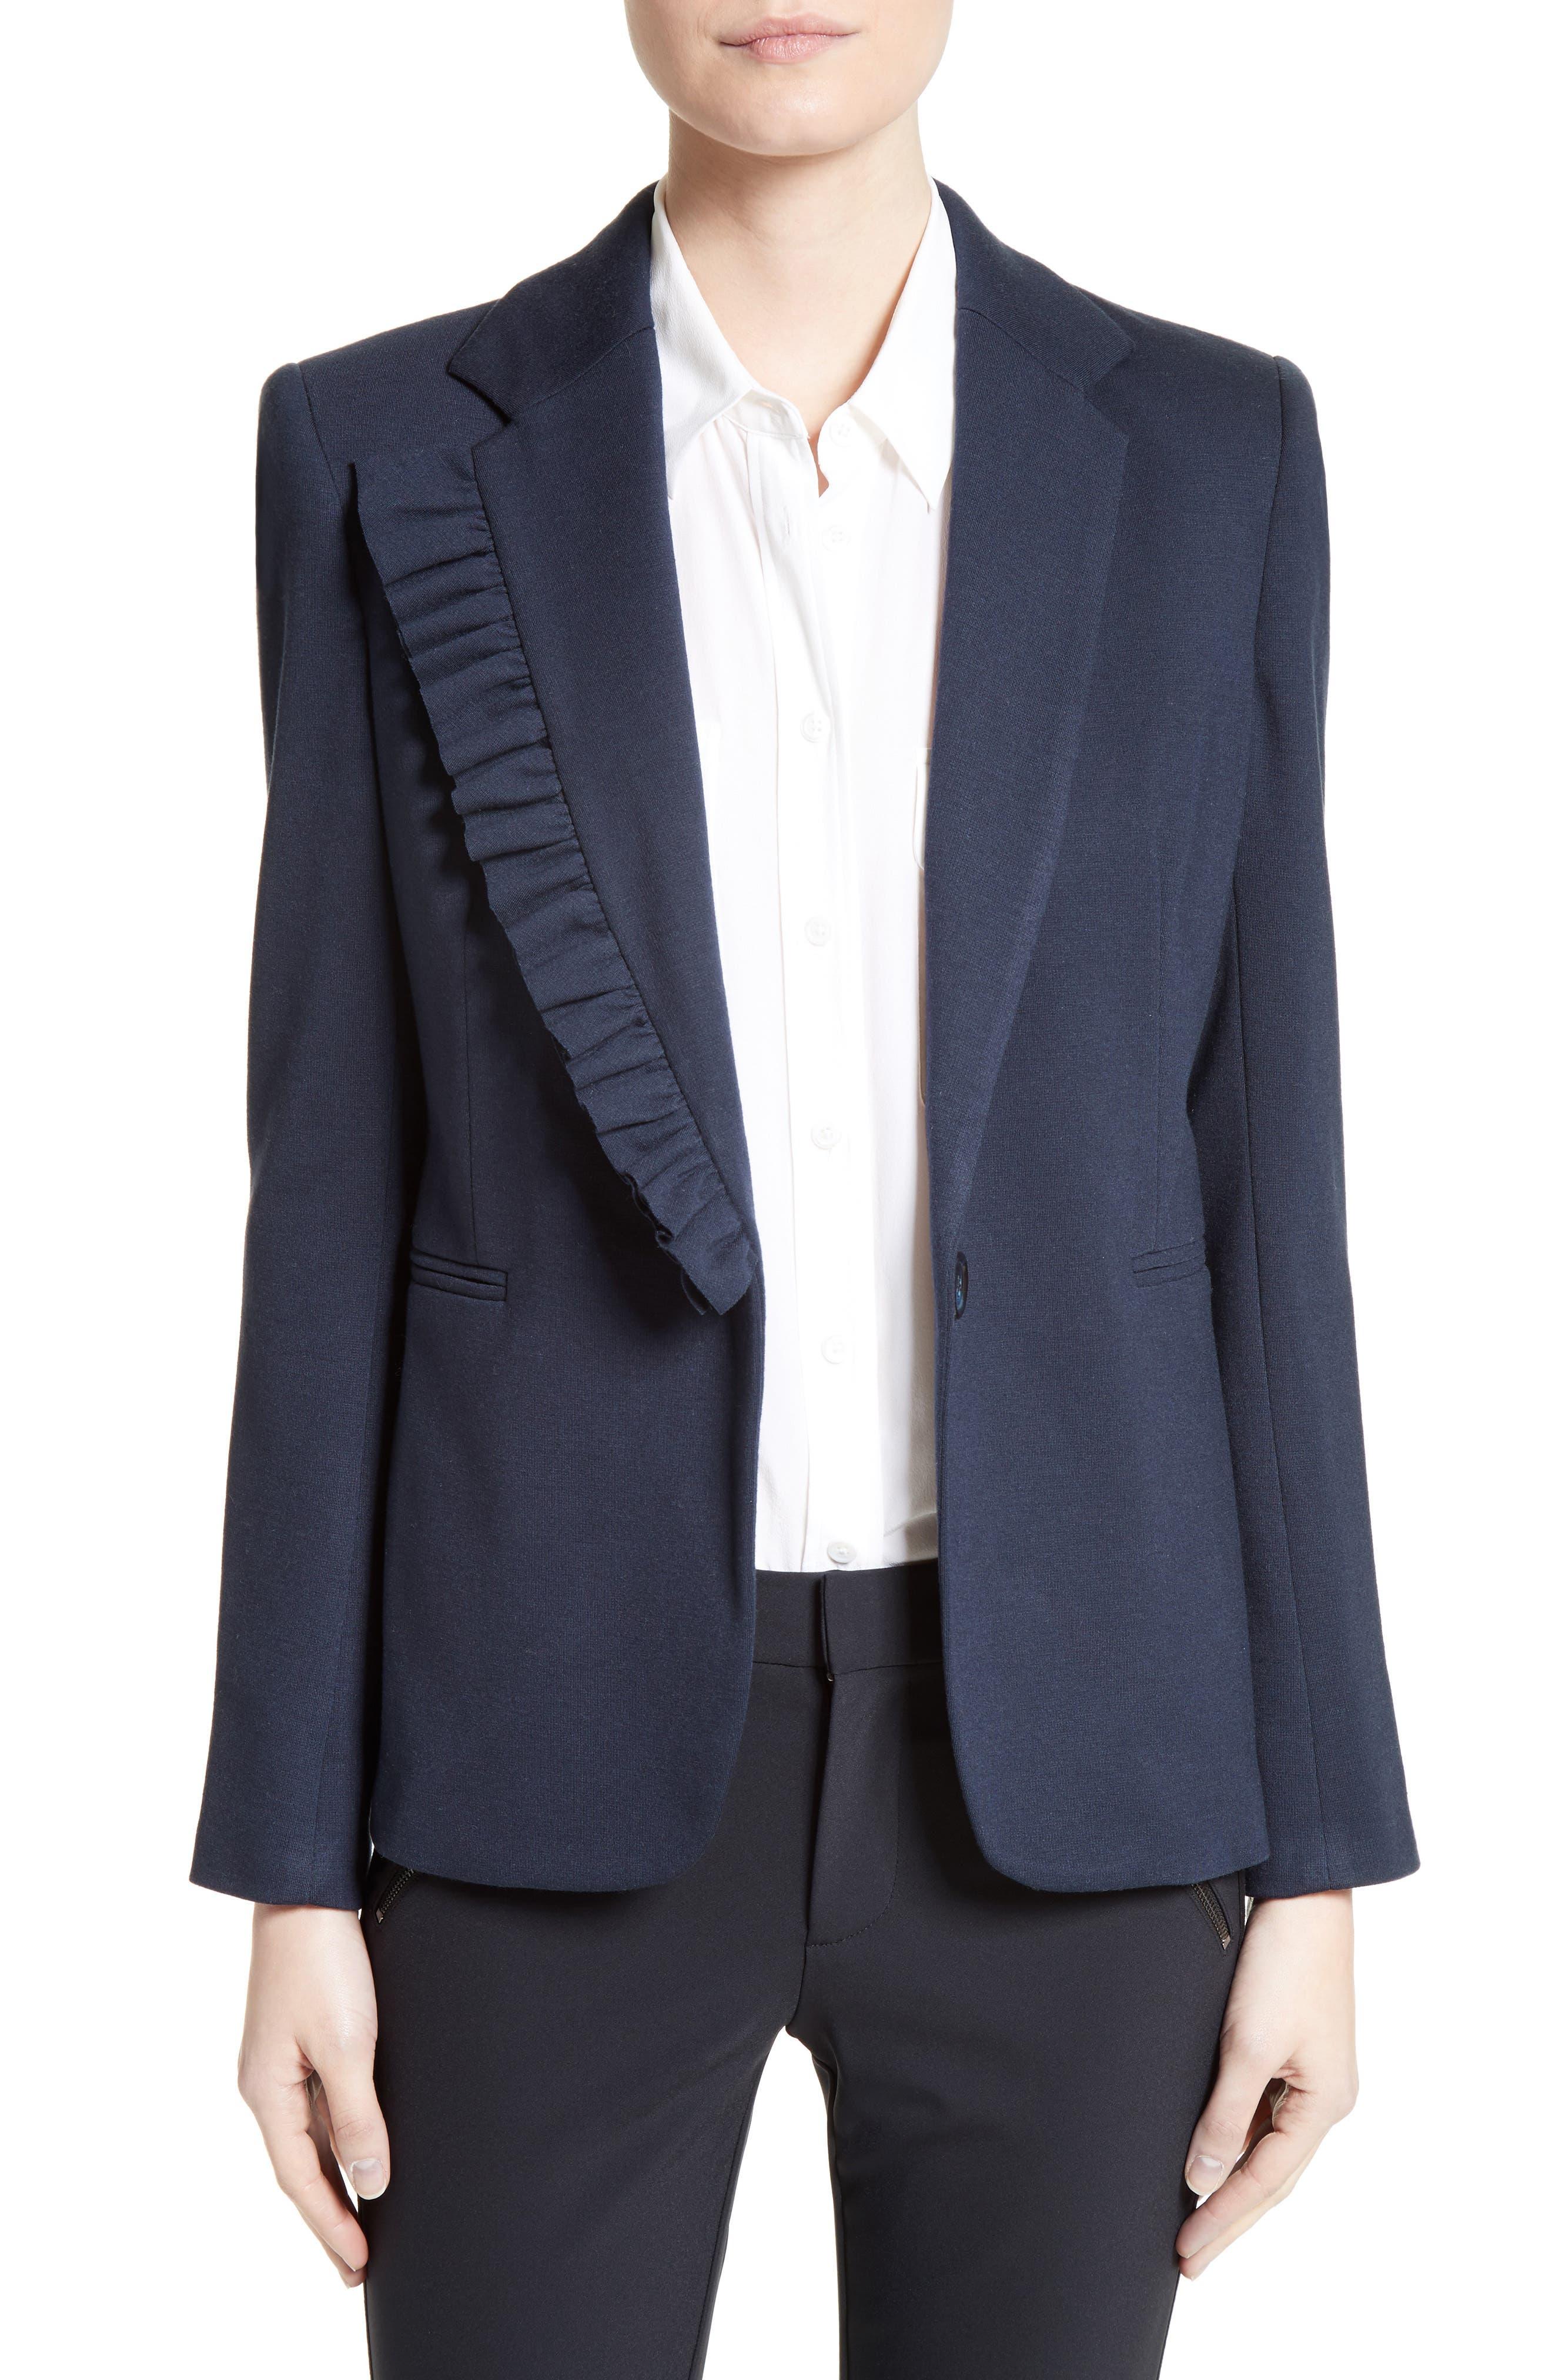 Helene Berman Frill Lapel Jacket